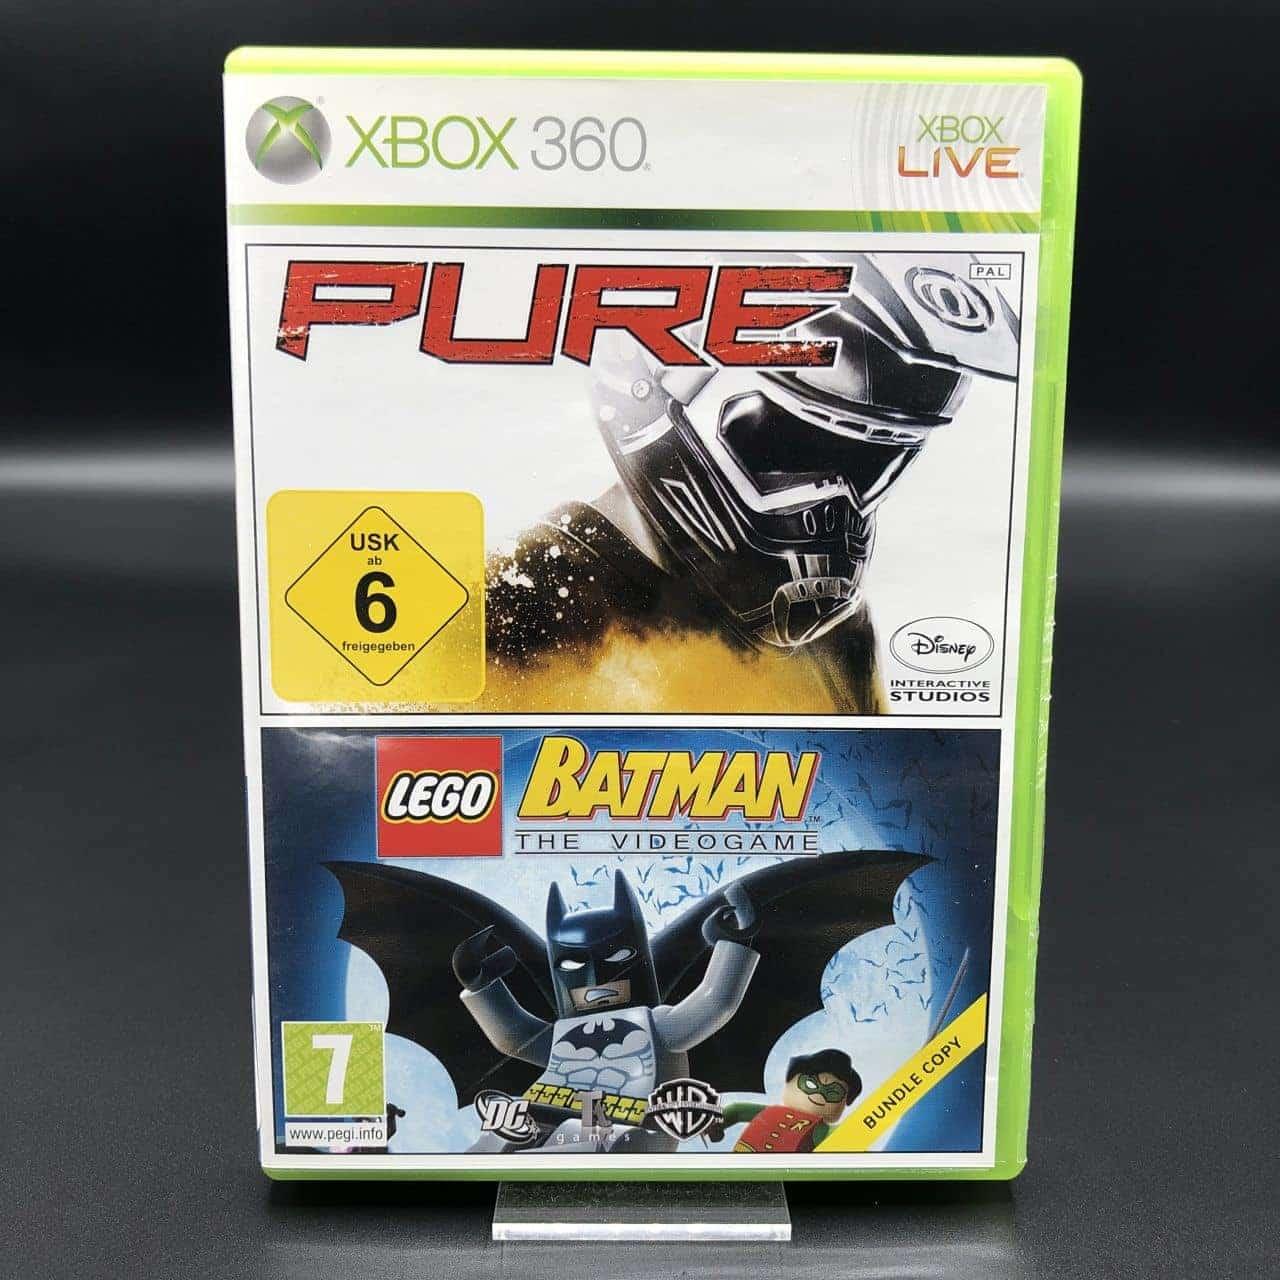 Pure + Lego Batman: The Videogame (Komplett) (Sehr gut) Xbox 360